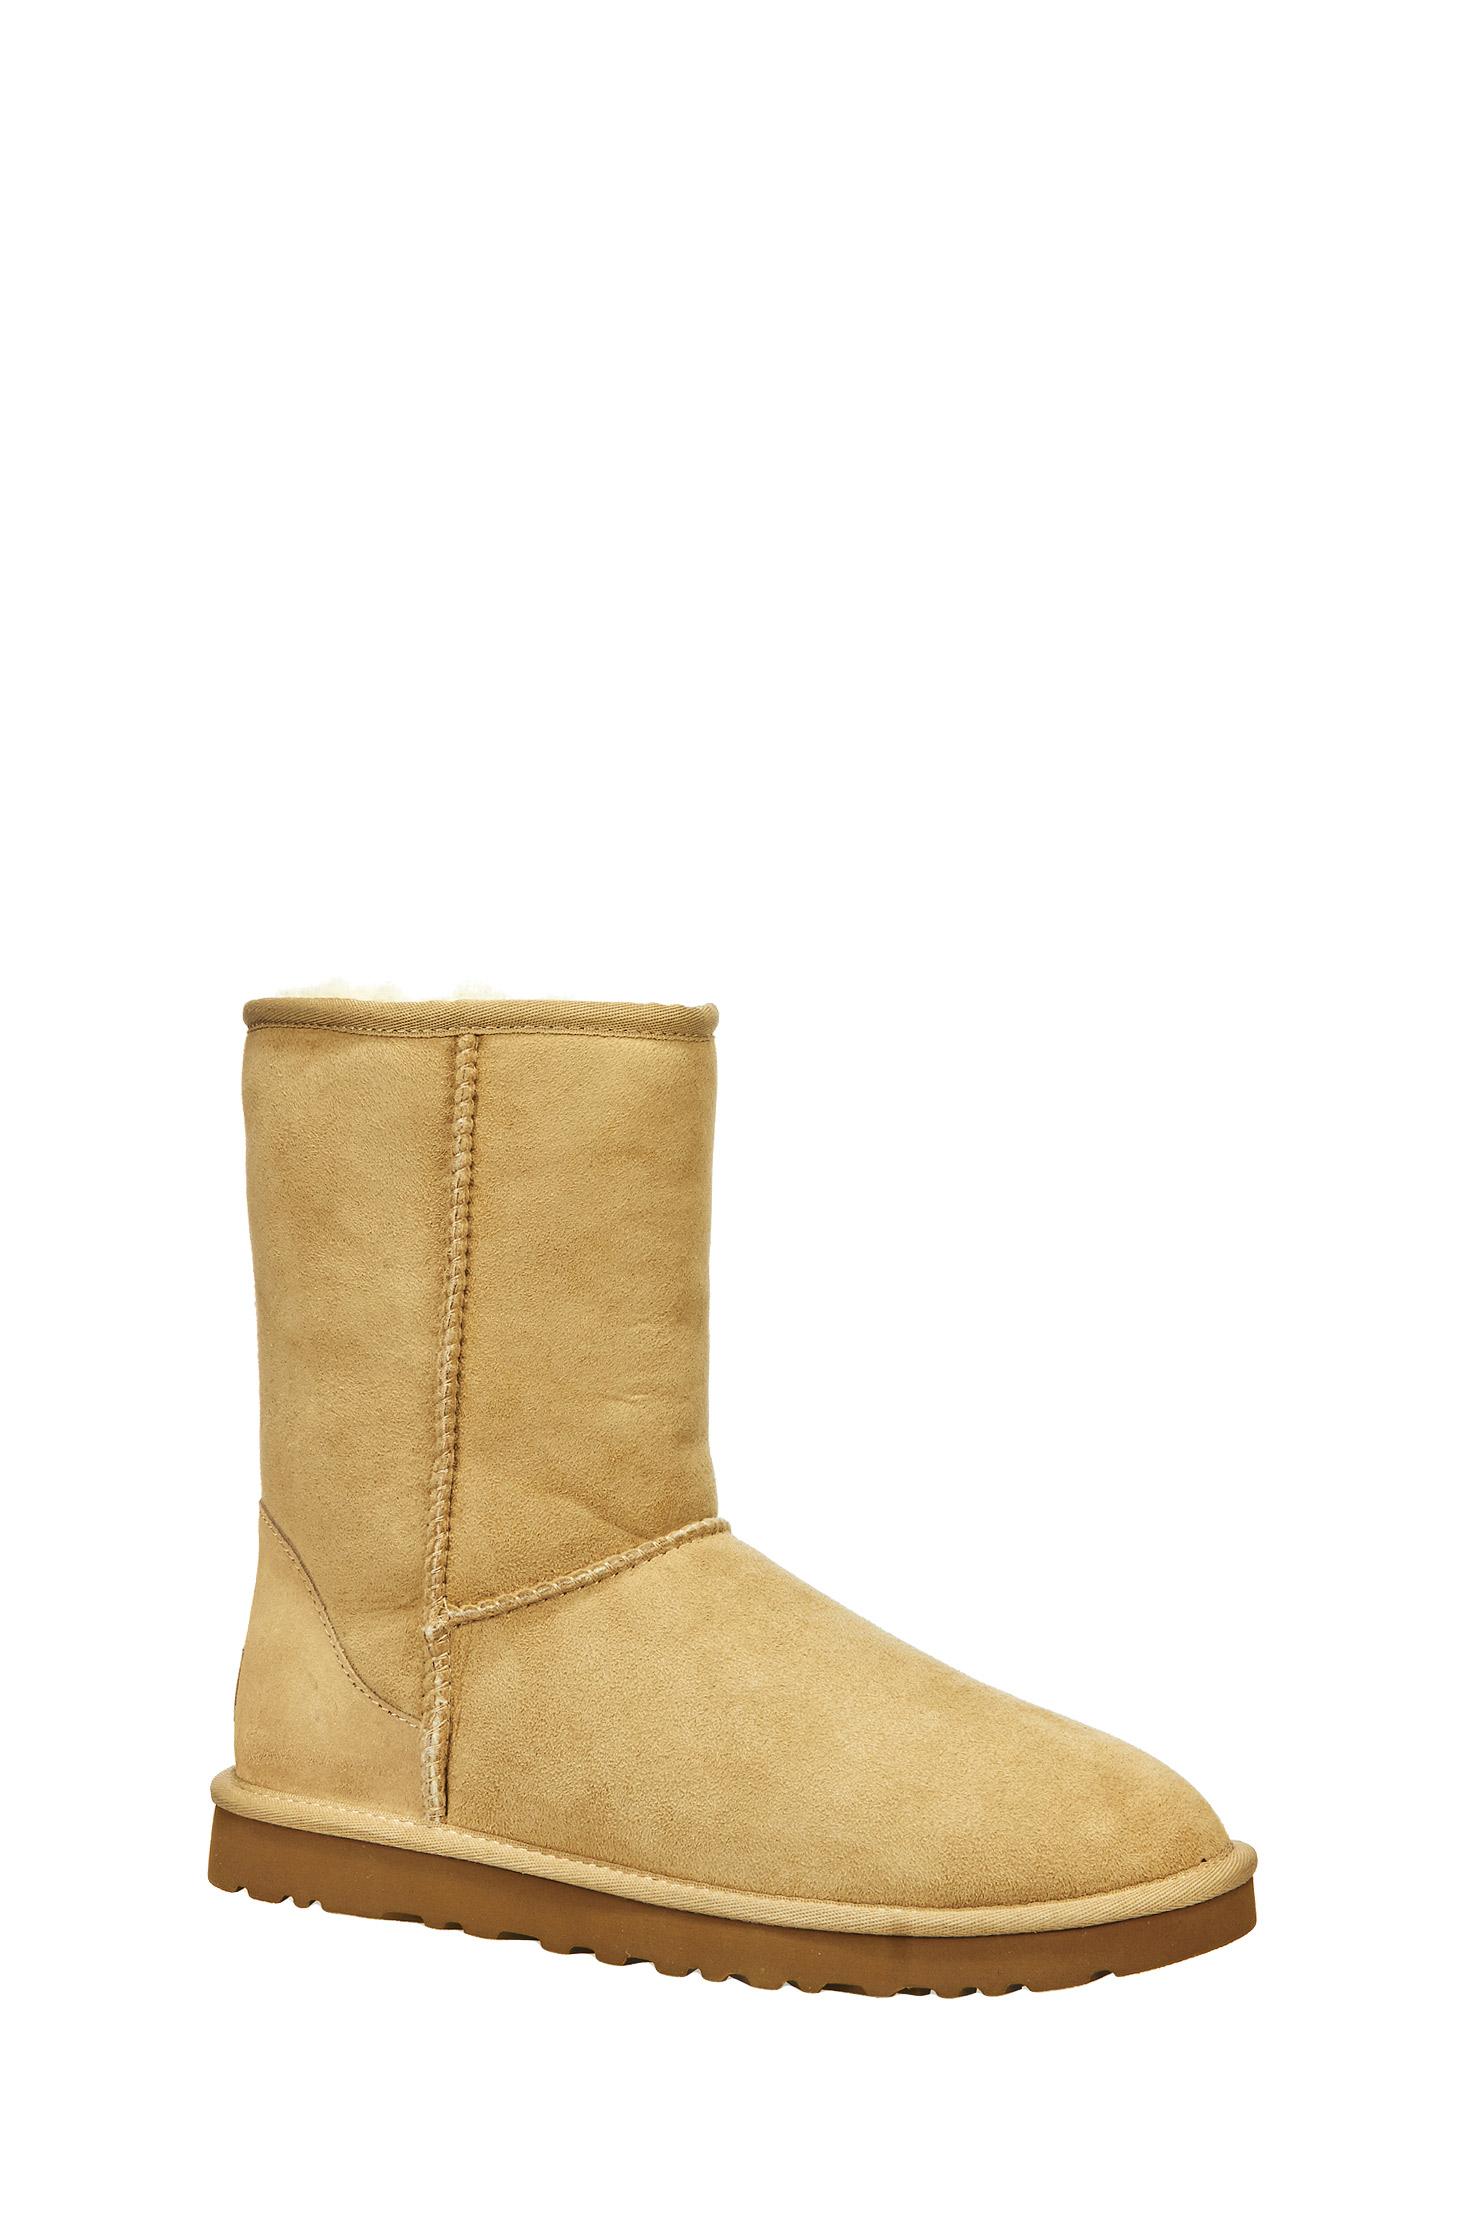 6a7b91534c2 Womens Short Tan Ugg Boots - cheap watches mgc-gas.com